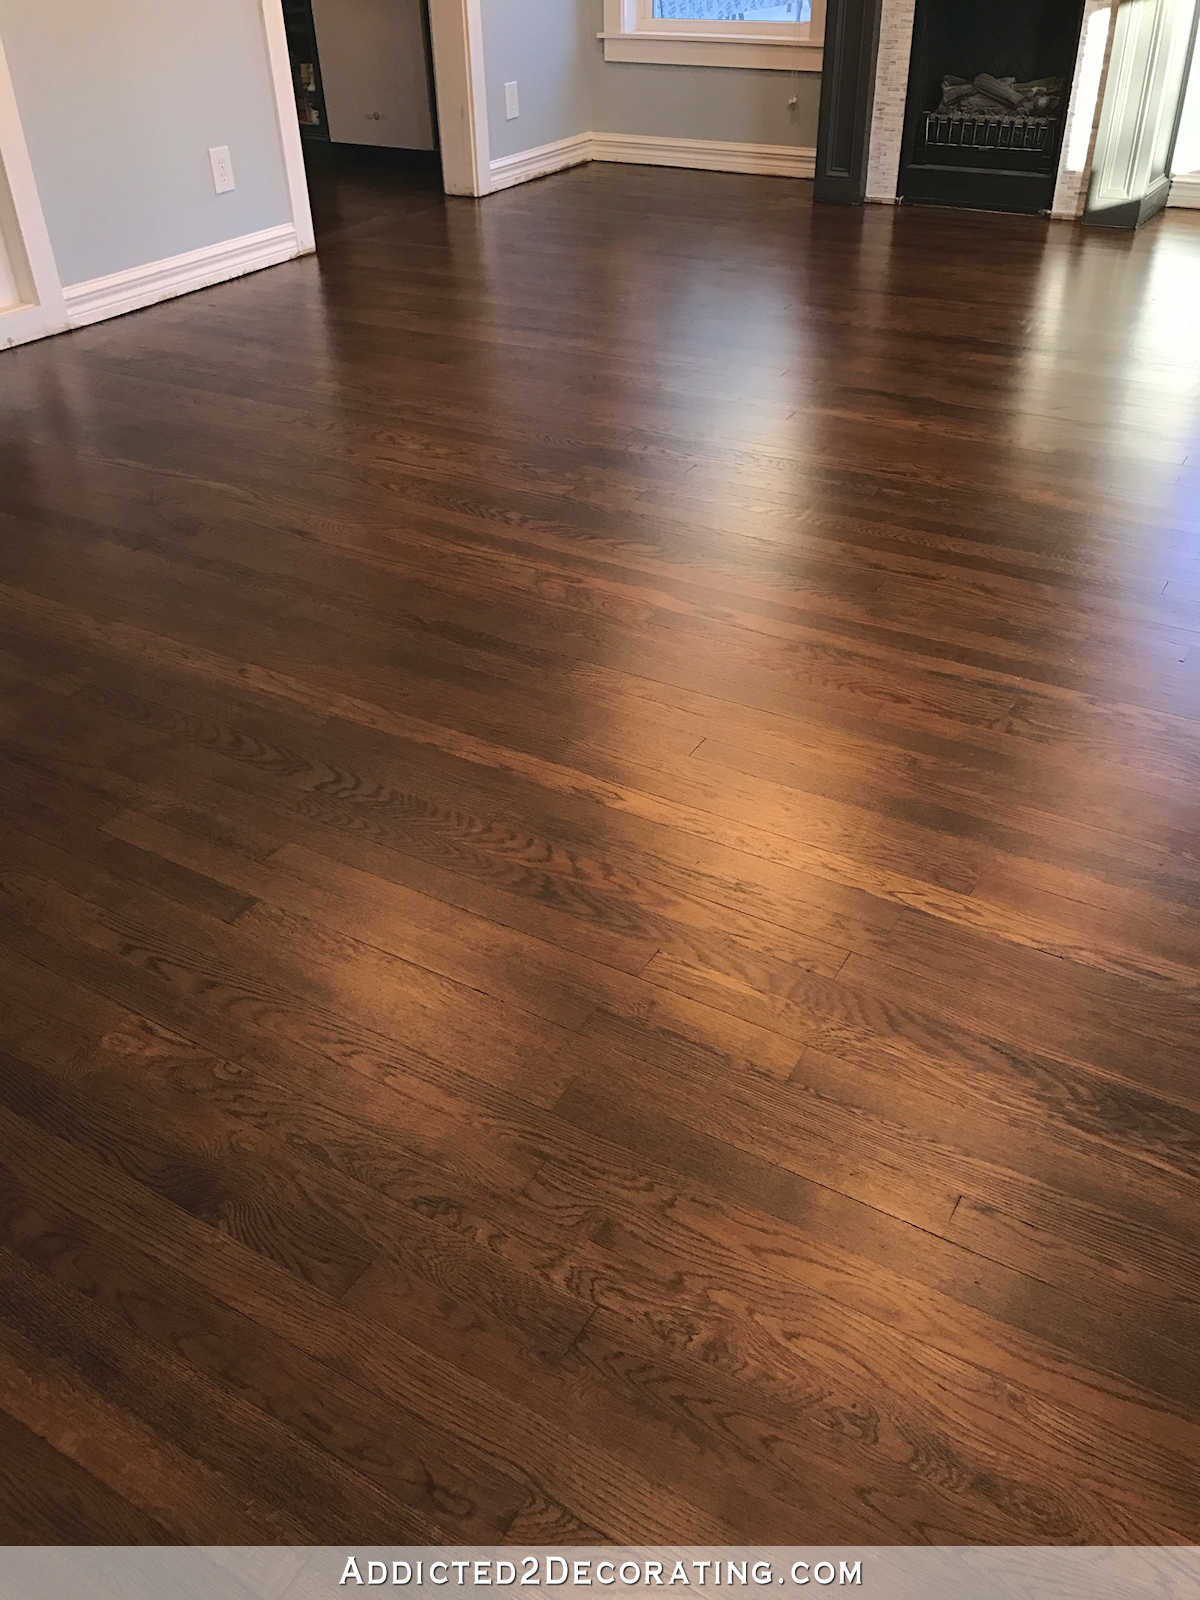 oak hardwood flooring refinished red oak hardwood floors - entryway and living room ZLOPSNQ